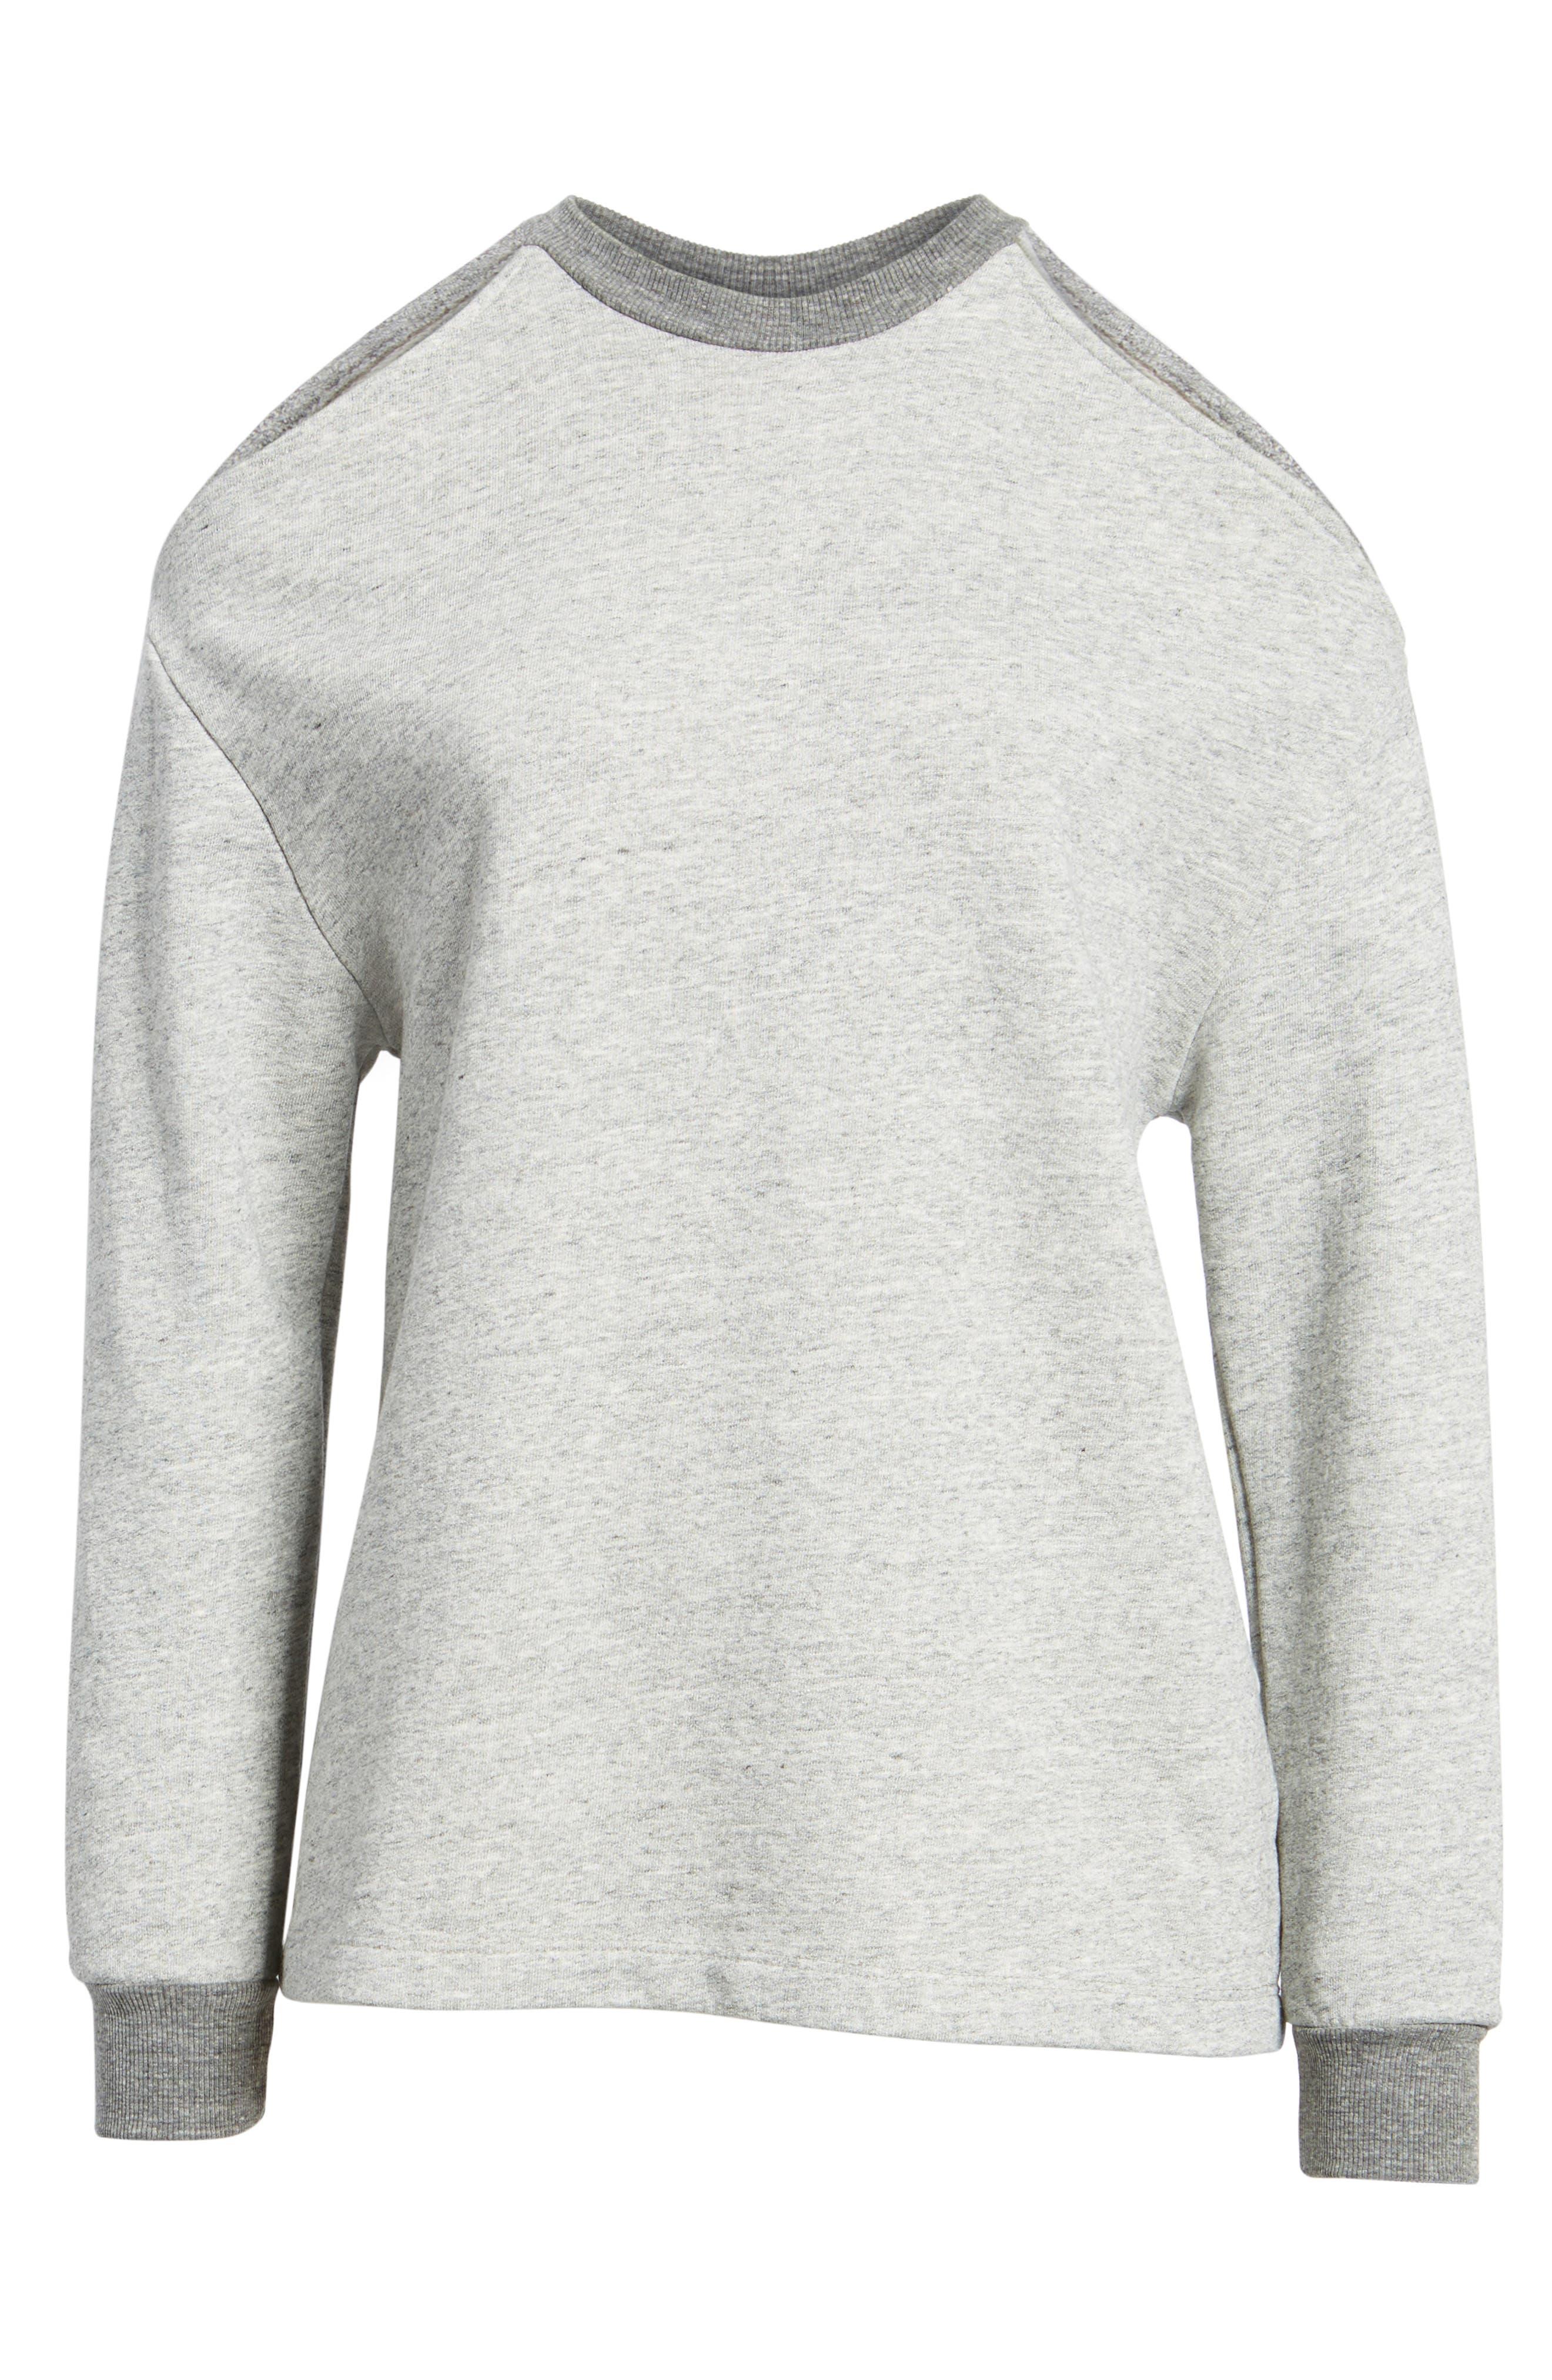 Gizi Cold Shoulder Sweatshirt,                             Alternate thumbnail 6, color,                             022